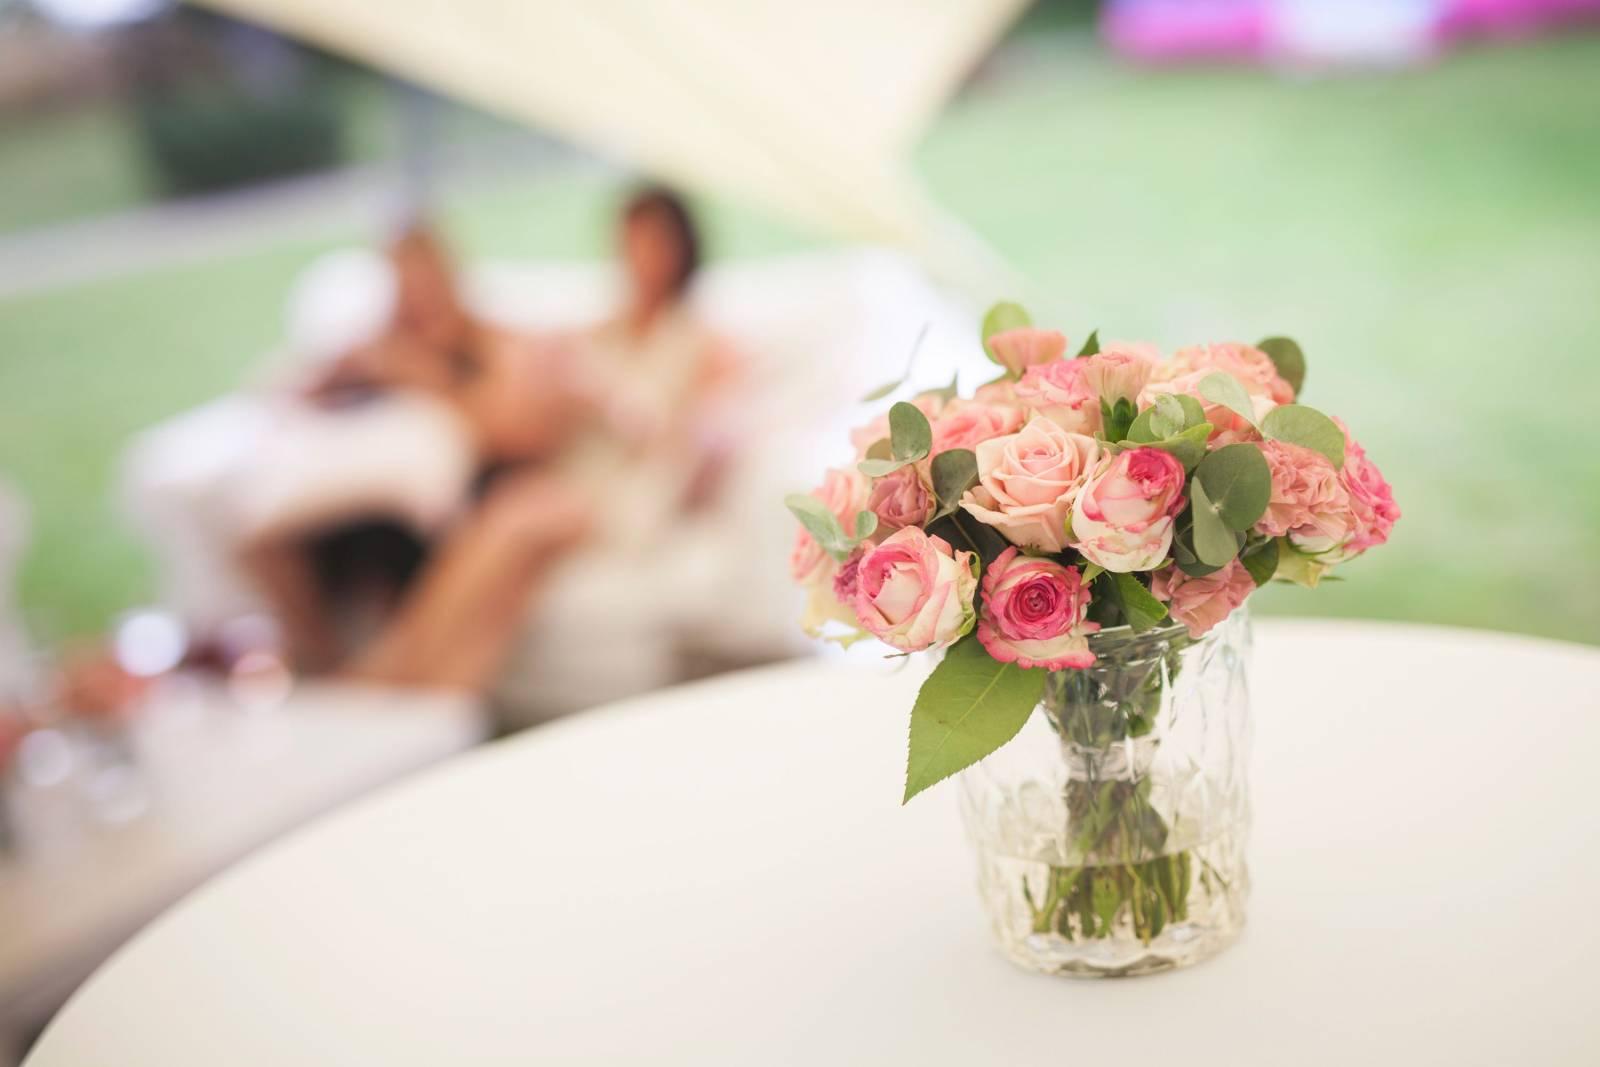 Carpe Diem Bloemen & Decoratie - House of Weddings  - 33